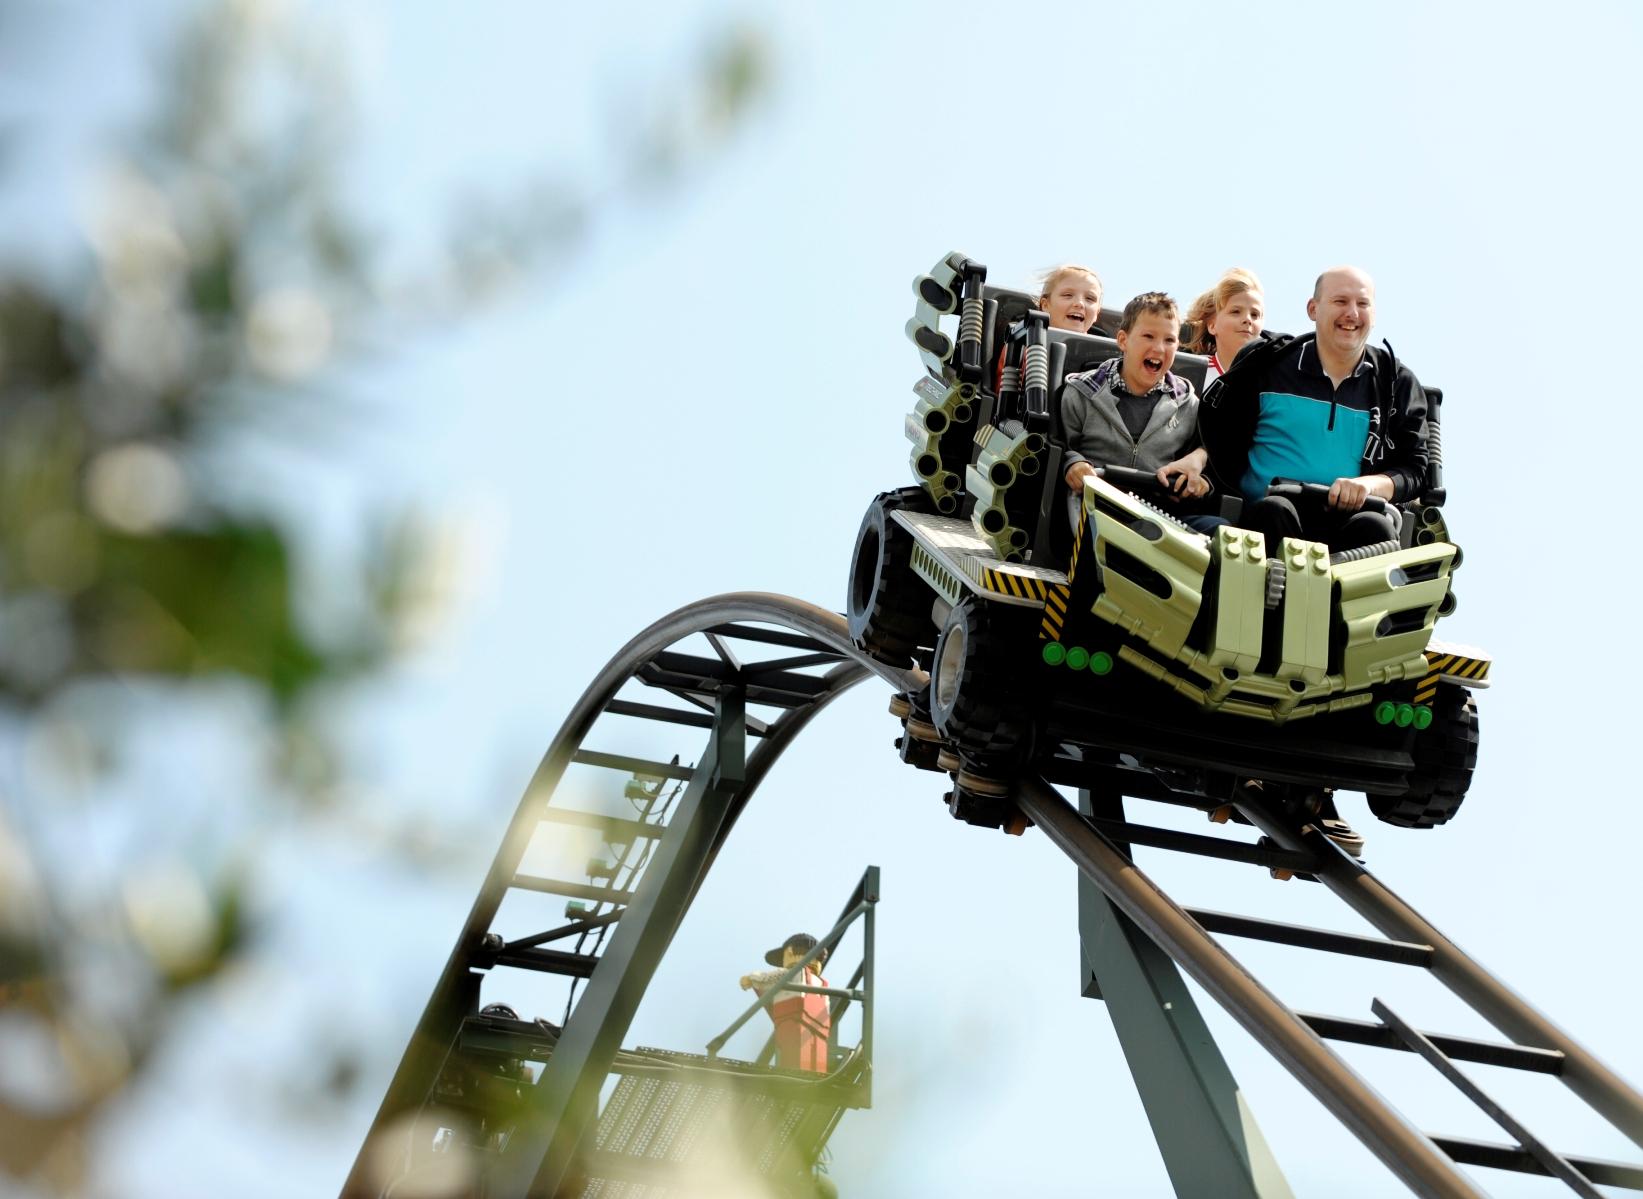 Xtreme Racers in Legoland Billund